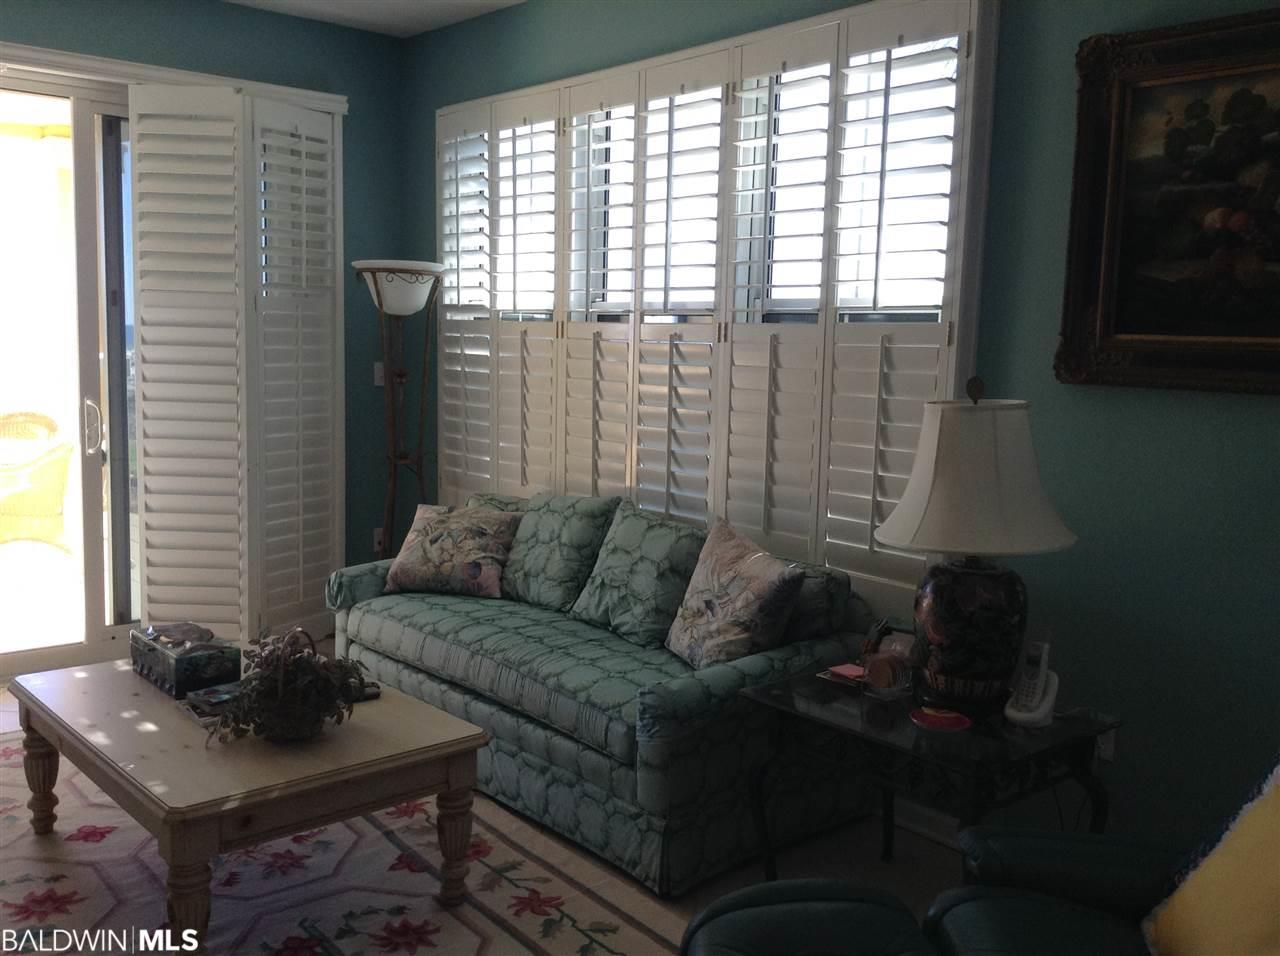 9350 Marigot Promenade #106 East, Gulf Shores, AL 36542